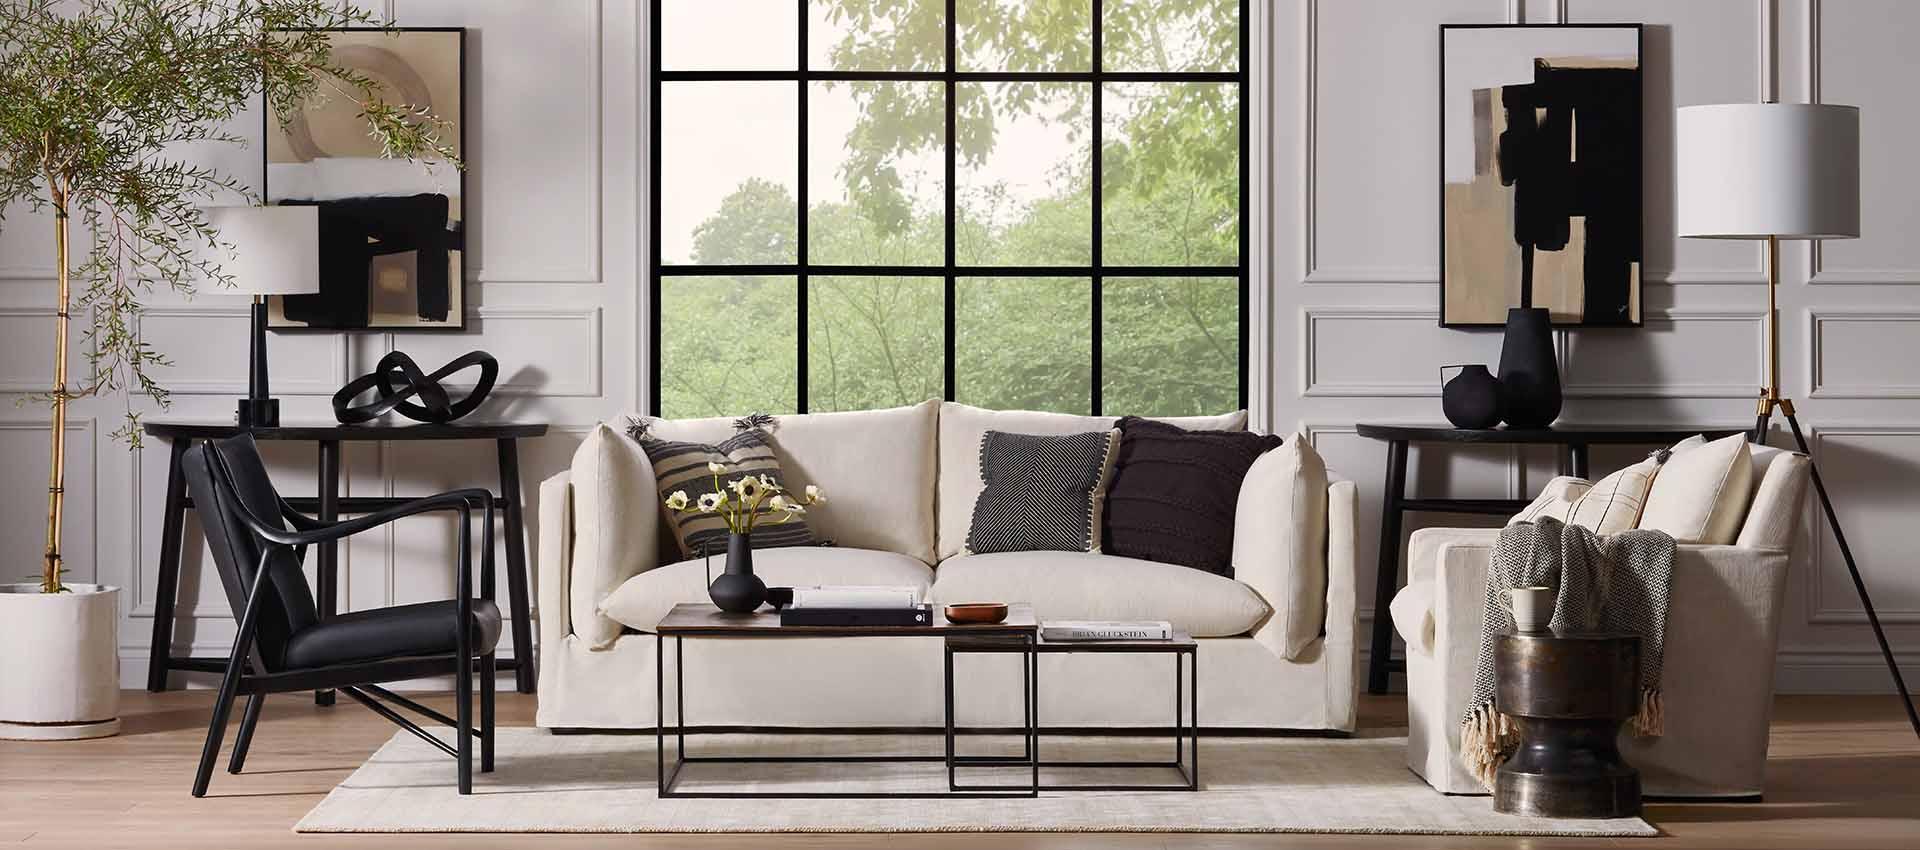 GlucksteinHome   living room furniture